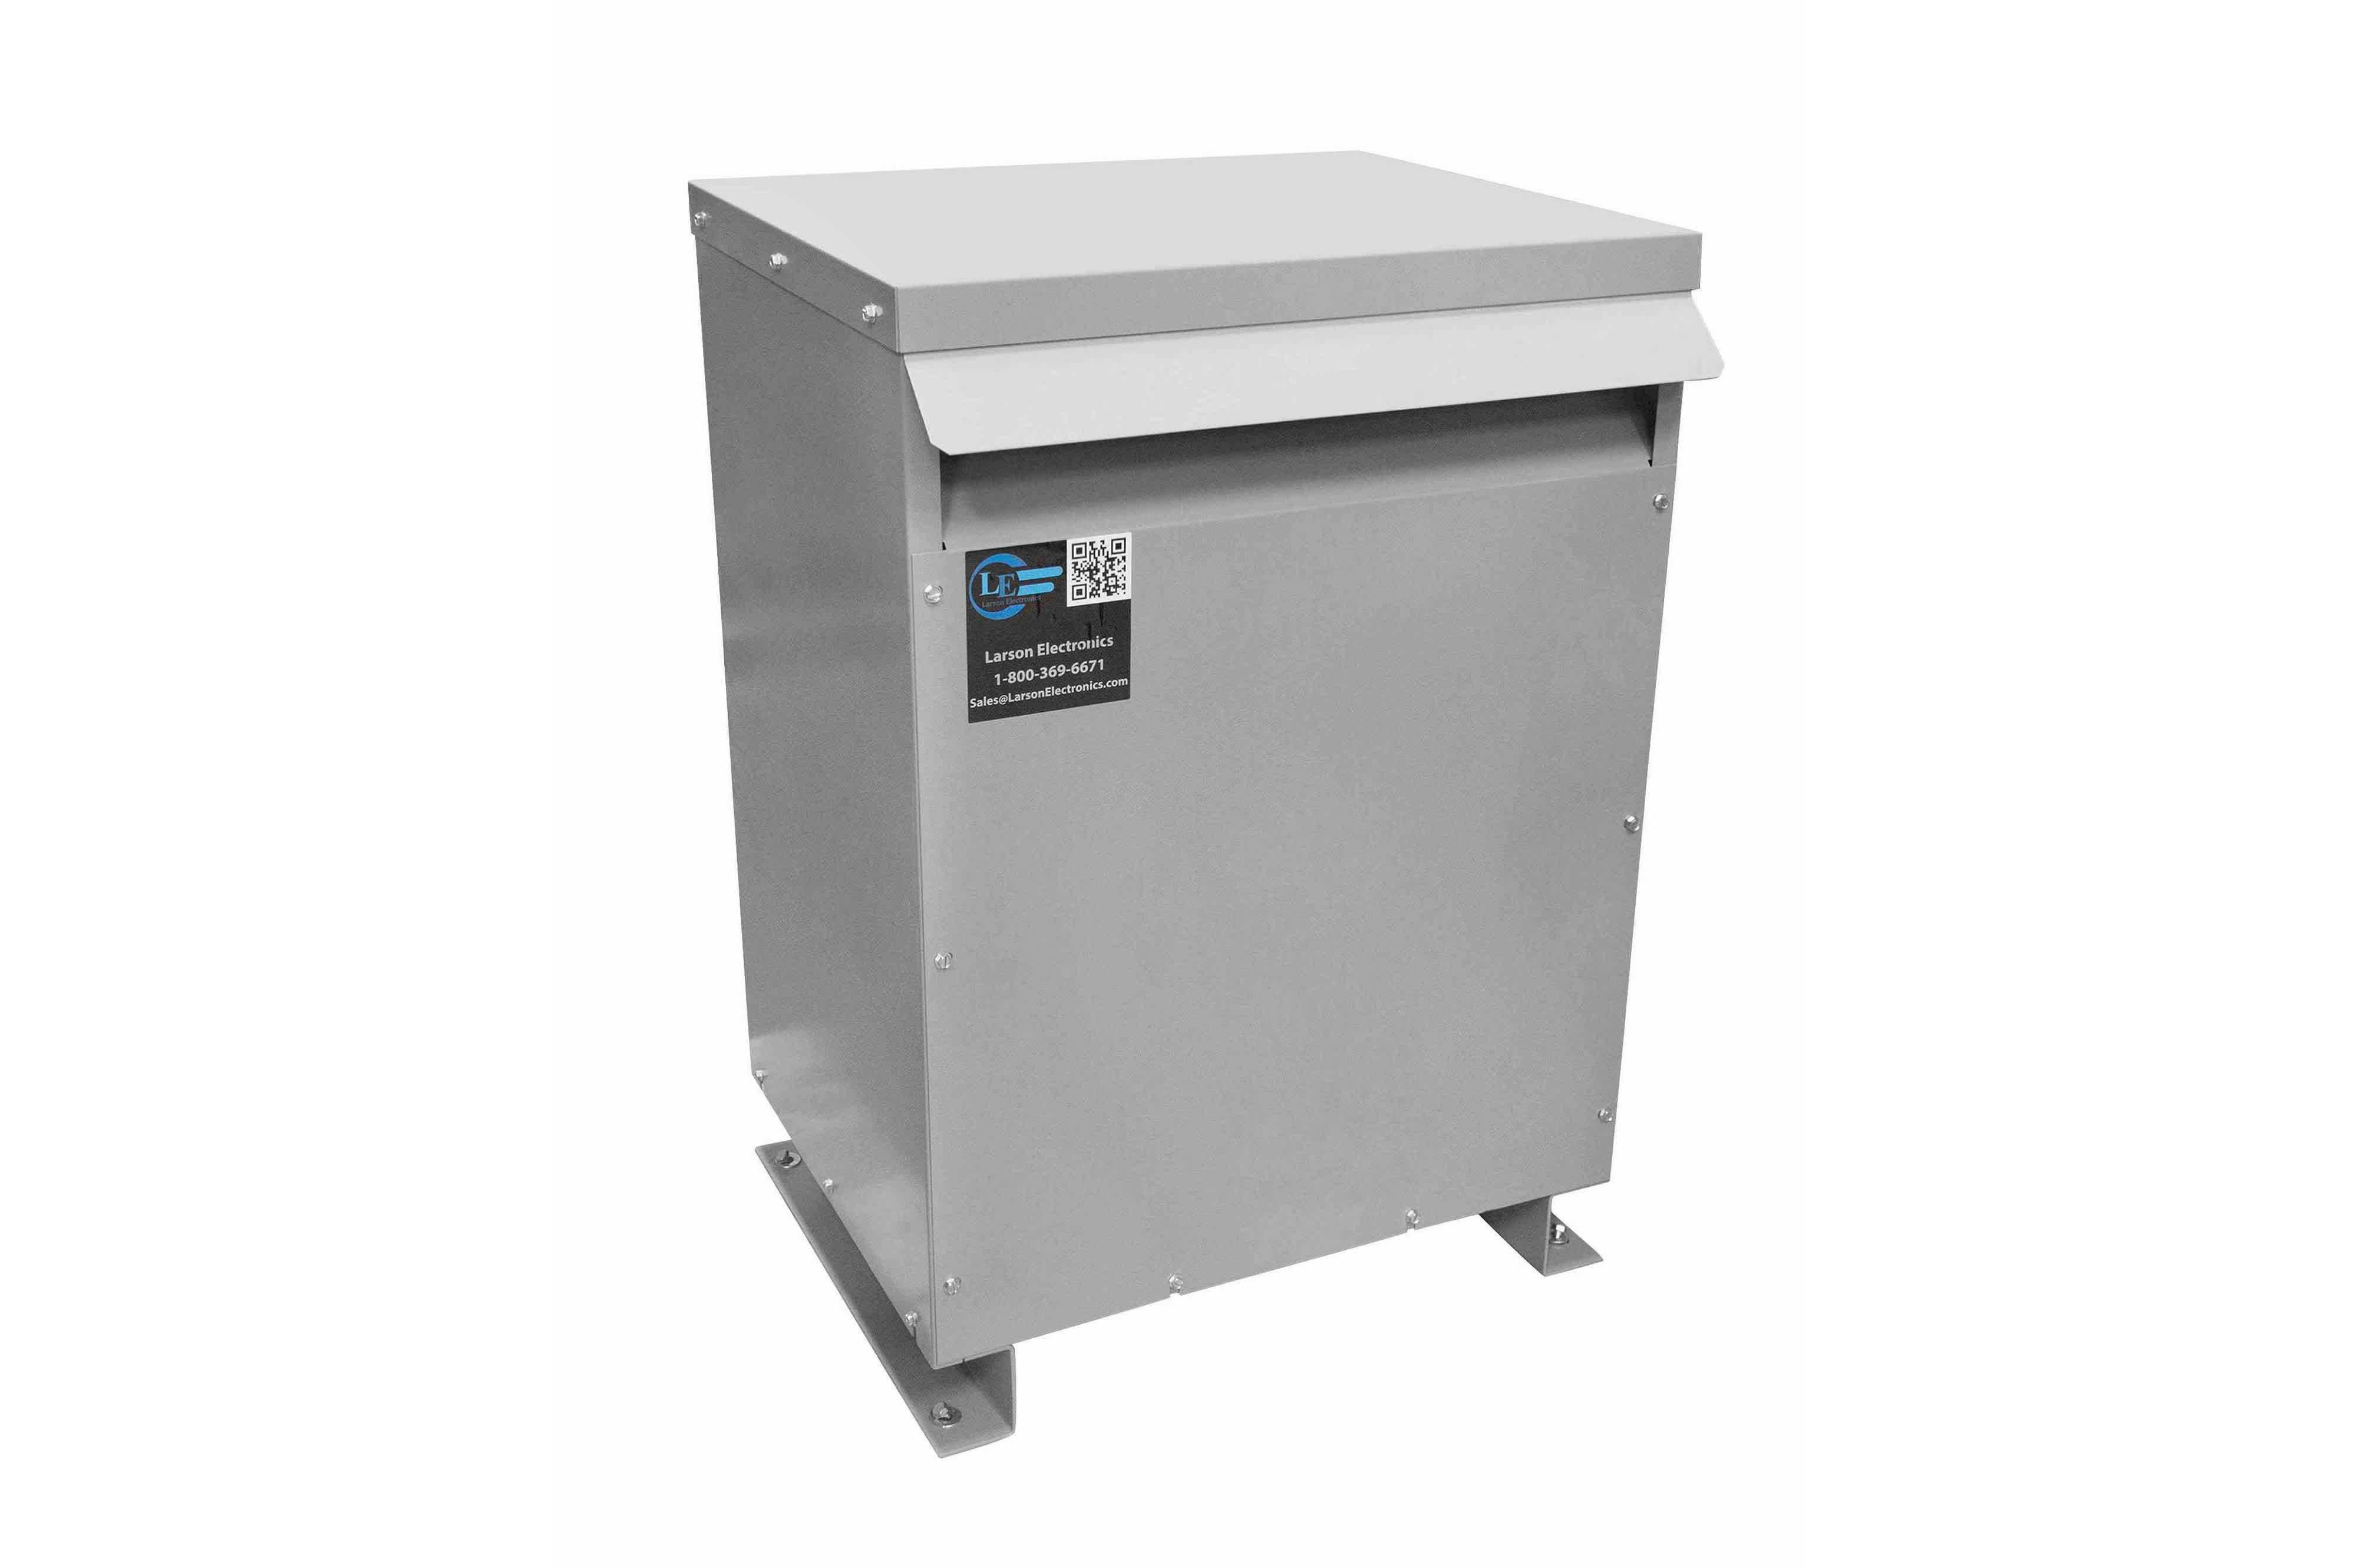 60 kVA 3PH Isolation Transformer, 240V Wye Primary, 600Y/347 Wye-N Secondary, N3R, Ventilated, 60 Hz